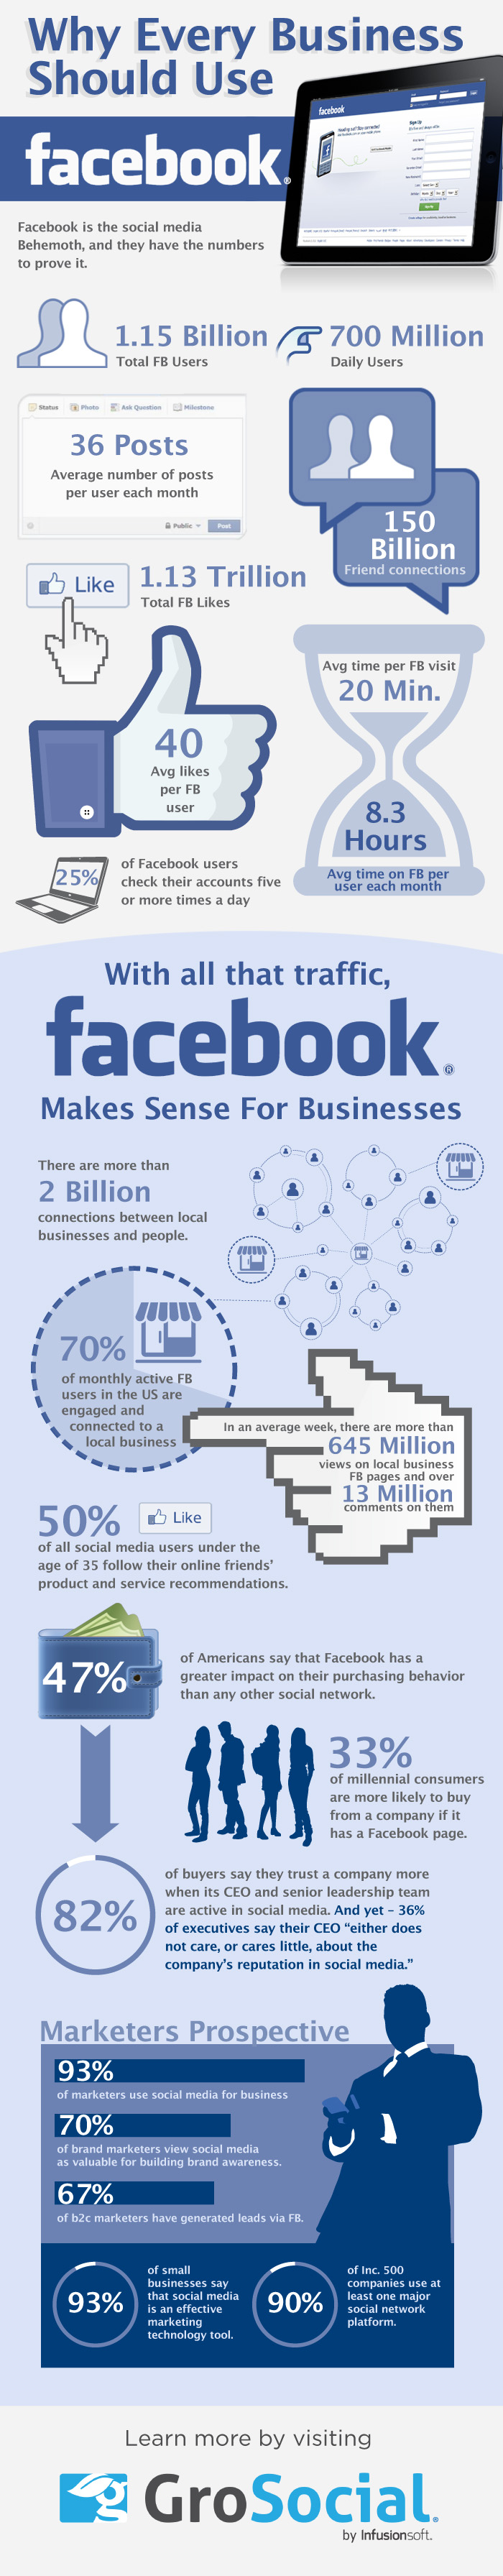 B2B companies need to use Facebook